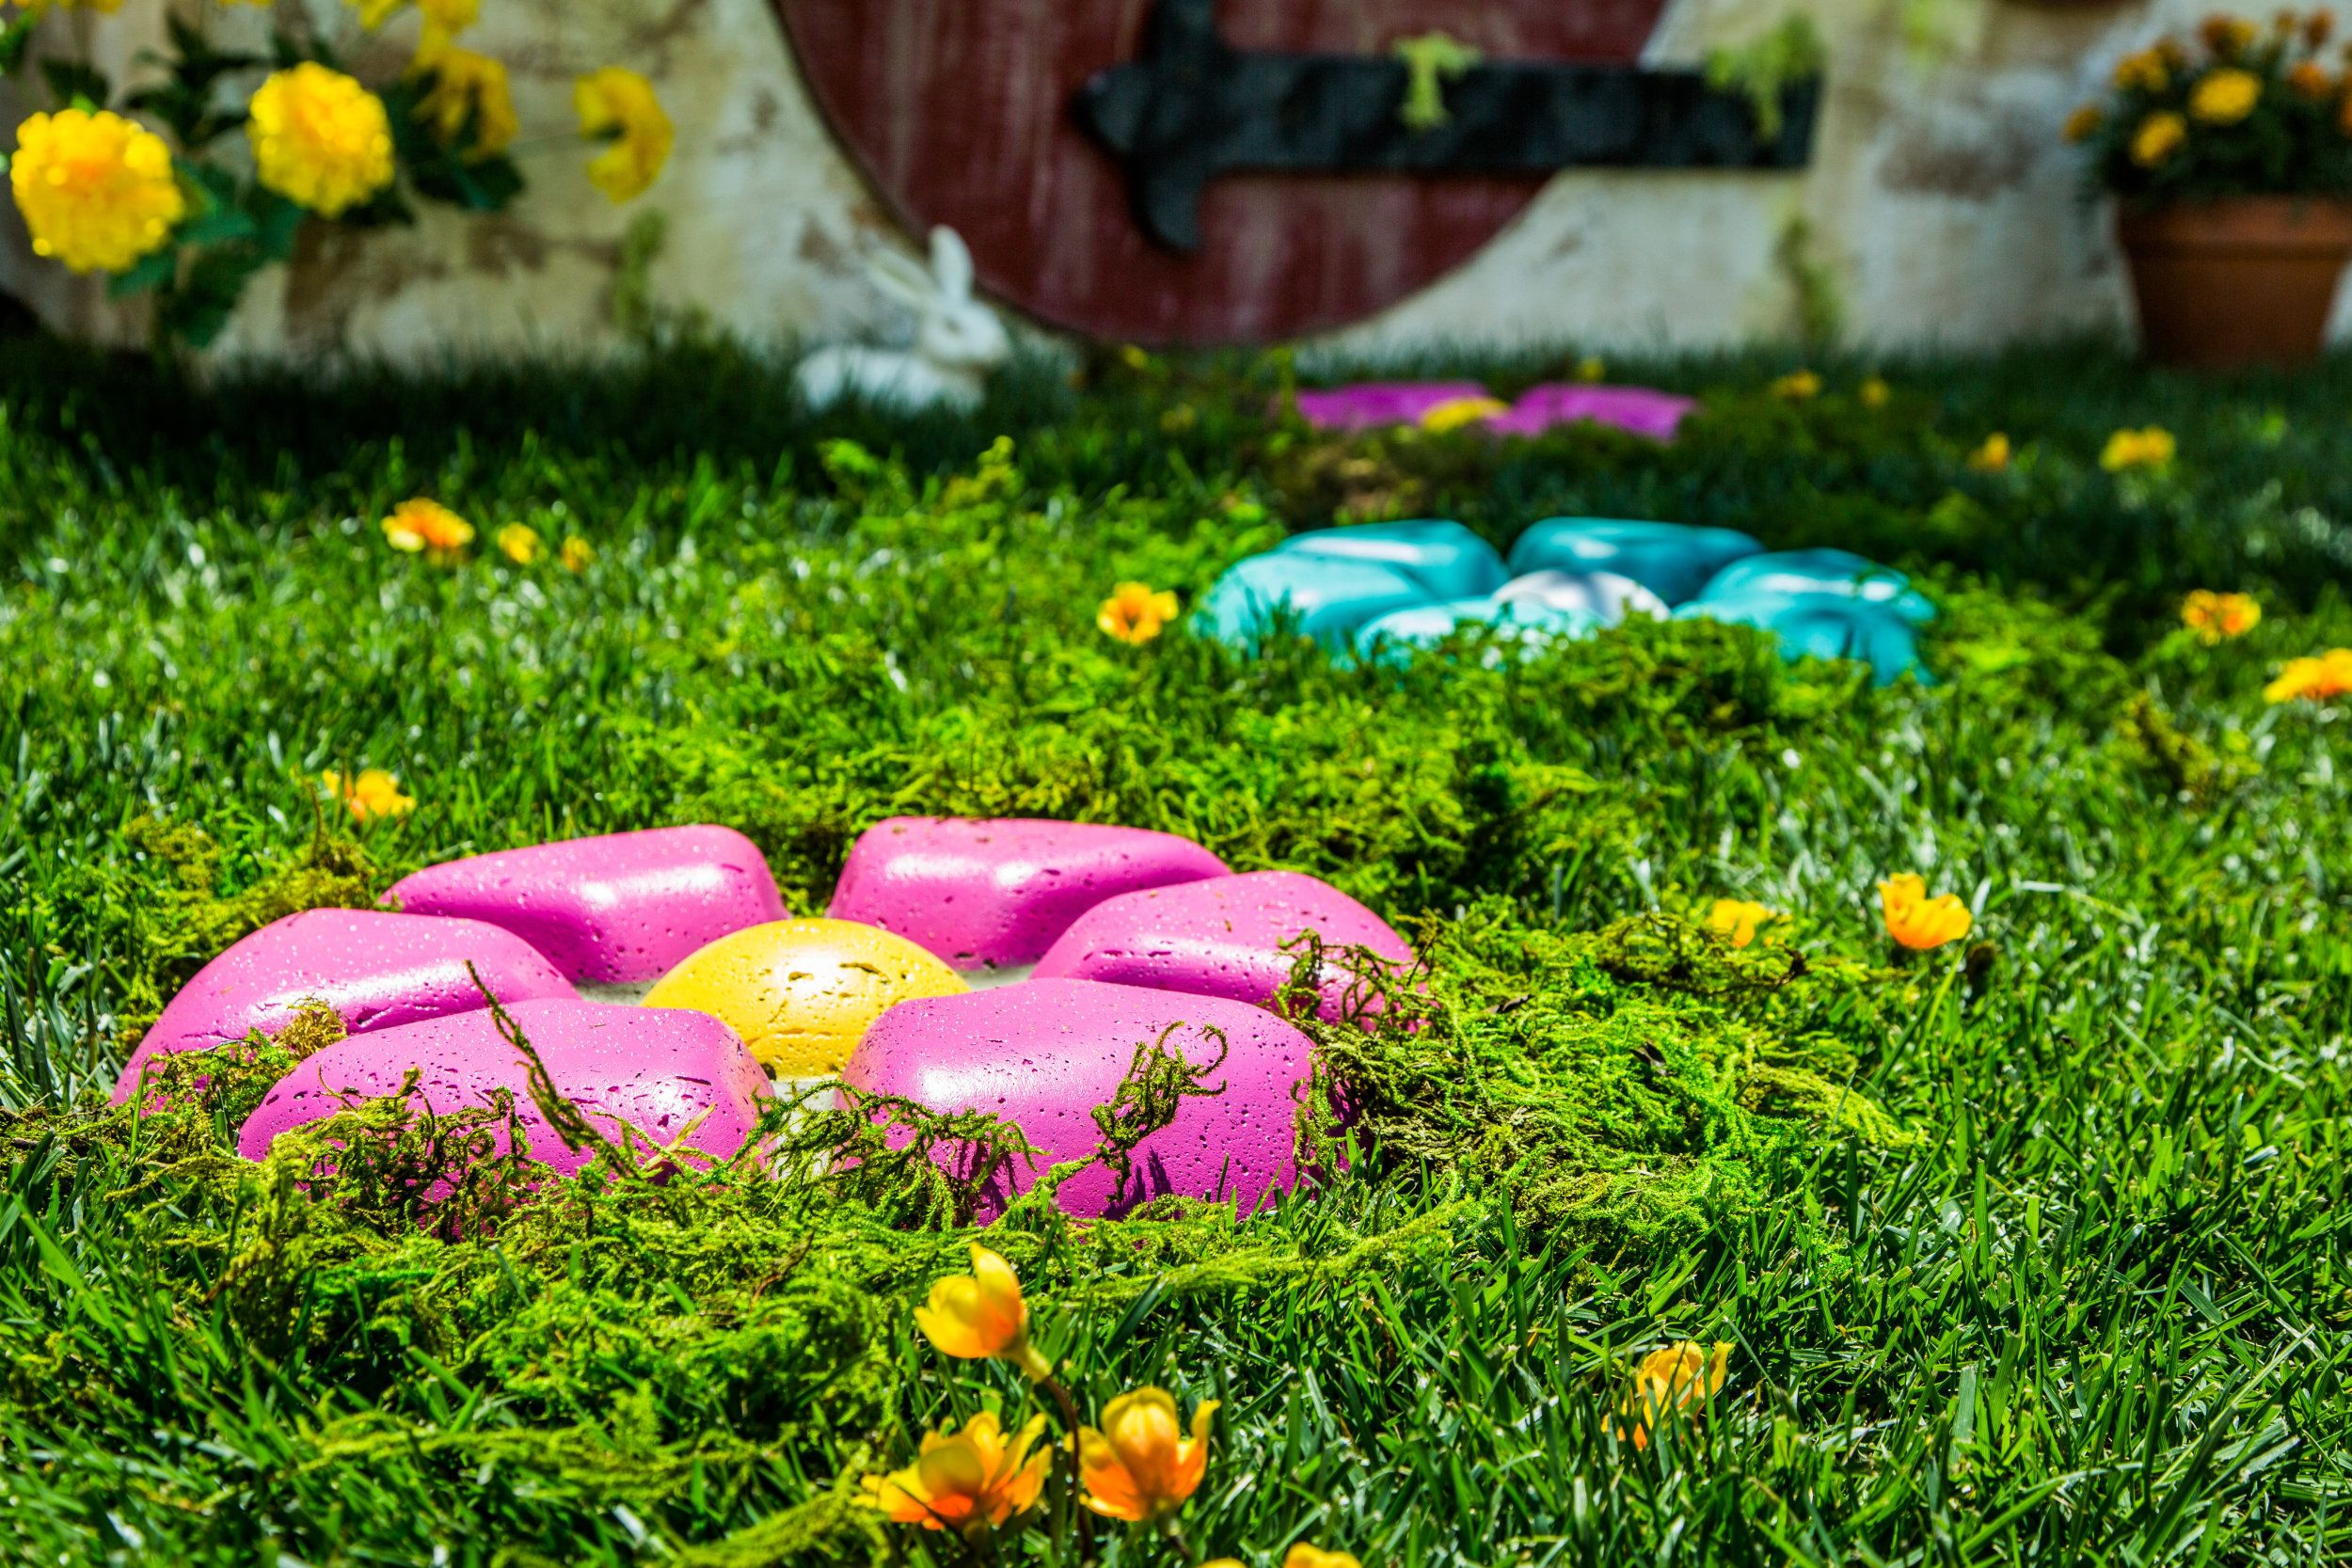 A springtime diy from diy finalist mark laferney do it yourself a springtime diy from diy finalist mark laferney solutioingenieria Choice Image